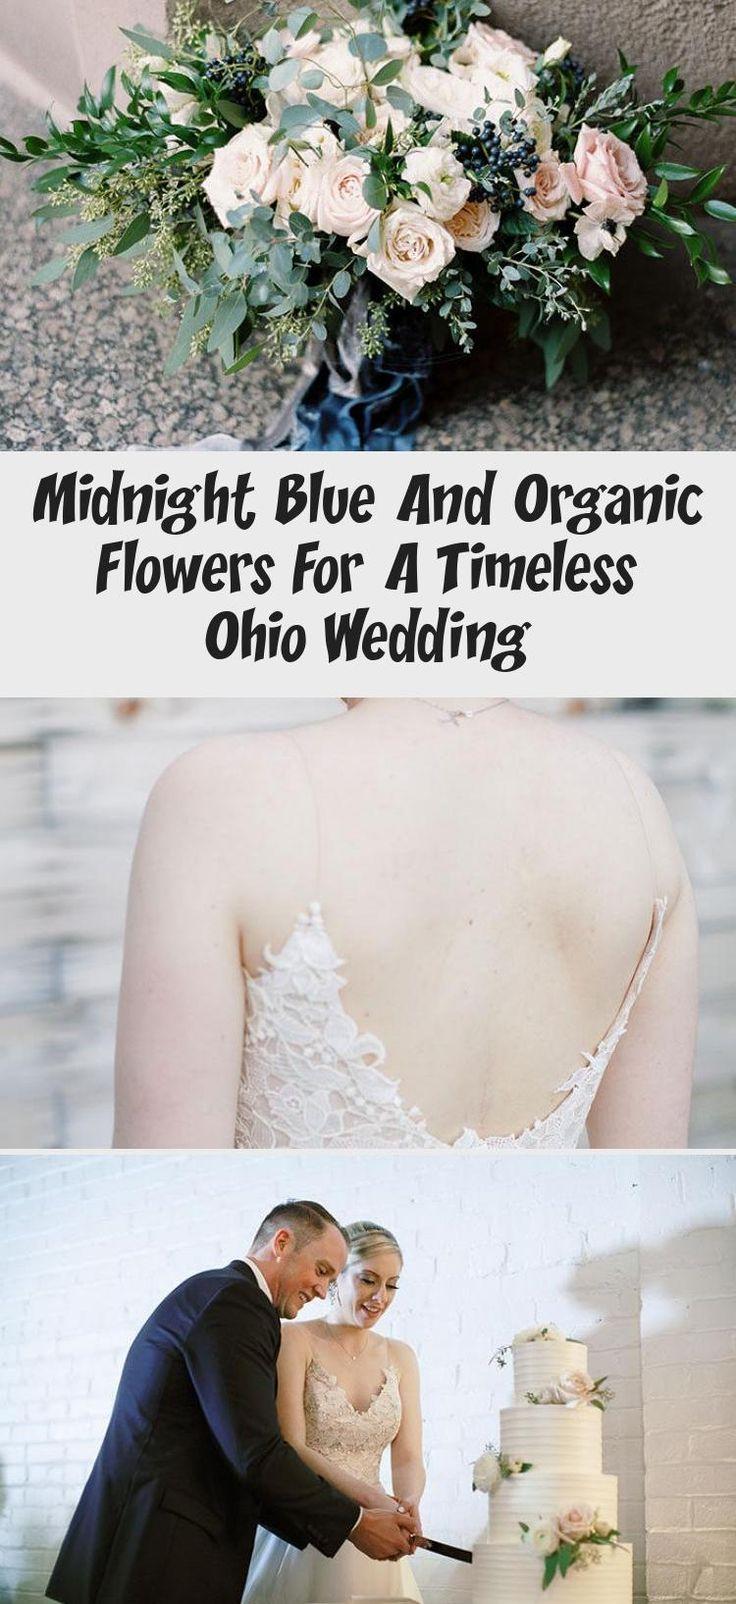 Midnight Blue Bridesmaid Dresses #SatinBridesmaidDresses #MermaidBridesmaidDresses #BridesmaidDressesWinter #ElegantBridesmaidDresses #BridesmaidDressesSequin